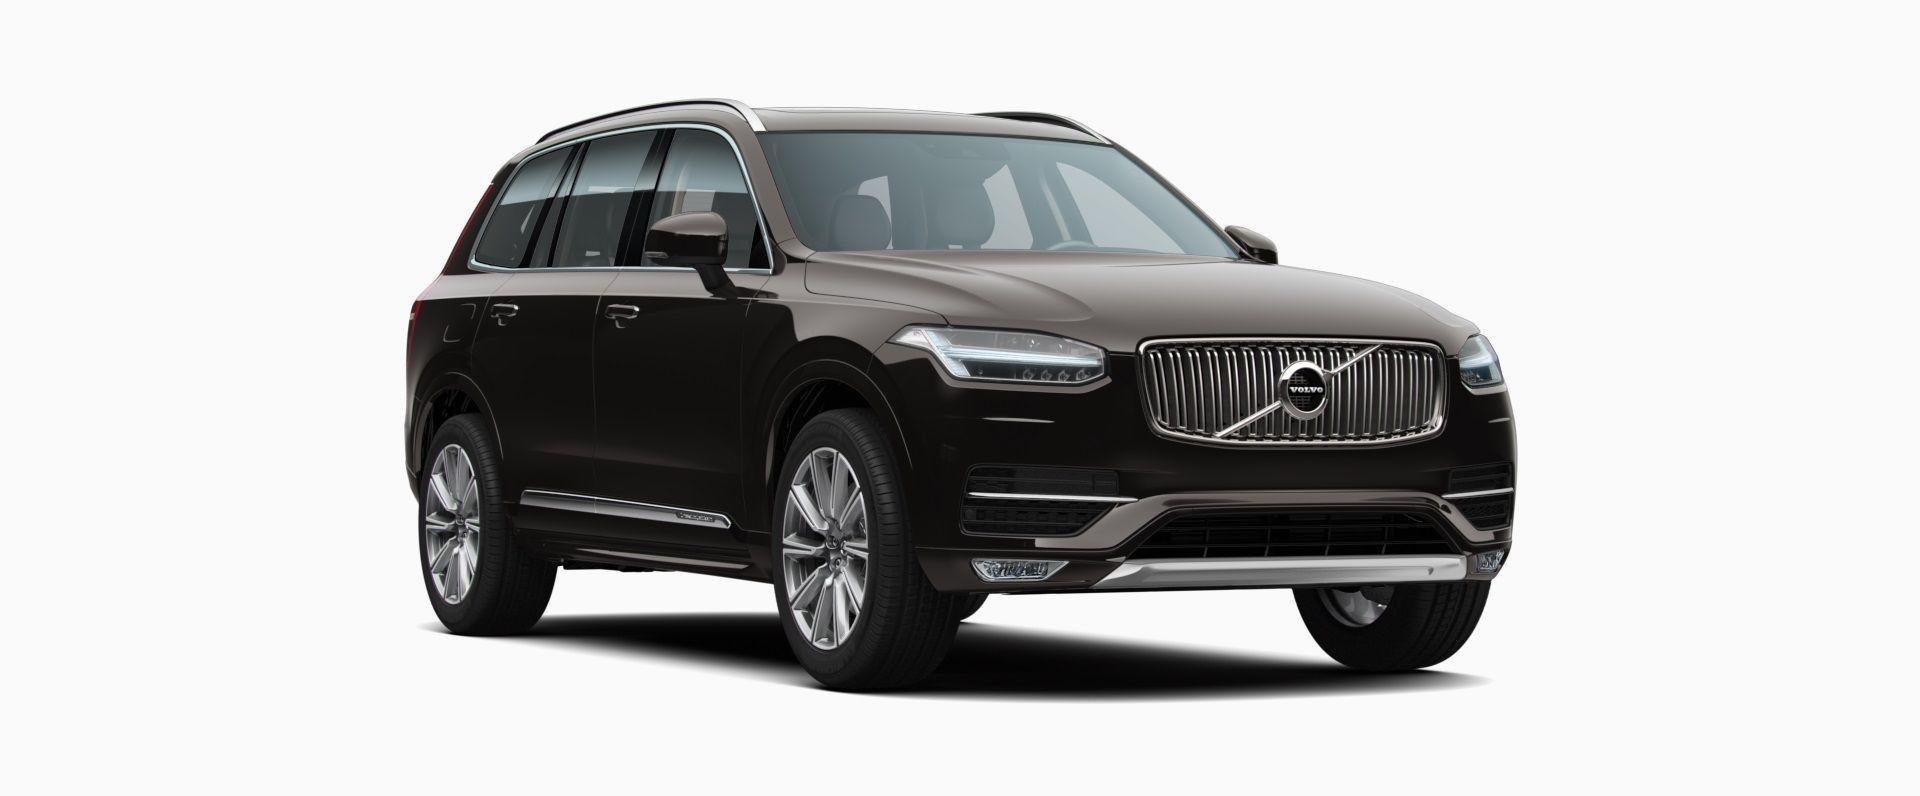 Build Your Volvo Volvo Cars Hyundai Cars Volvo Cars Cars Uk